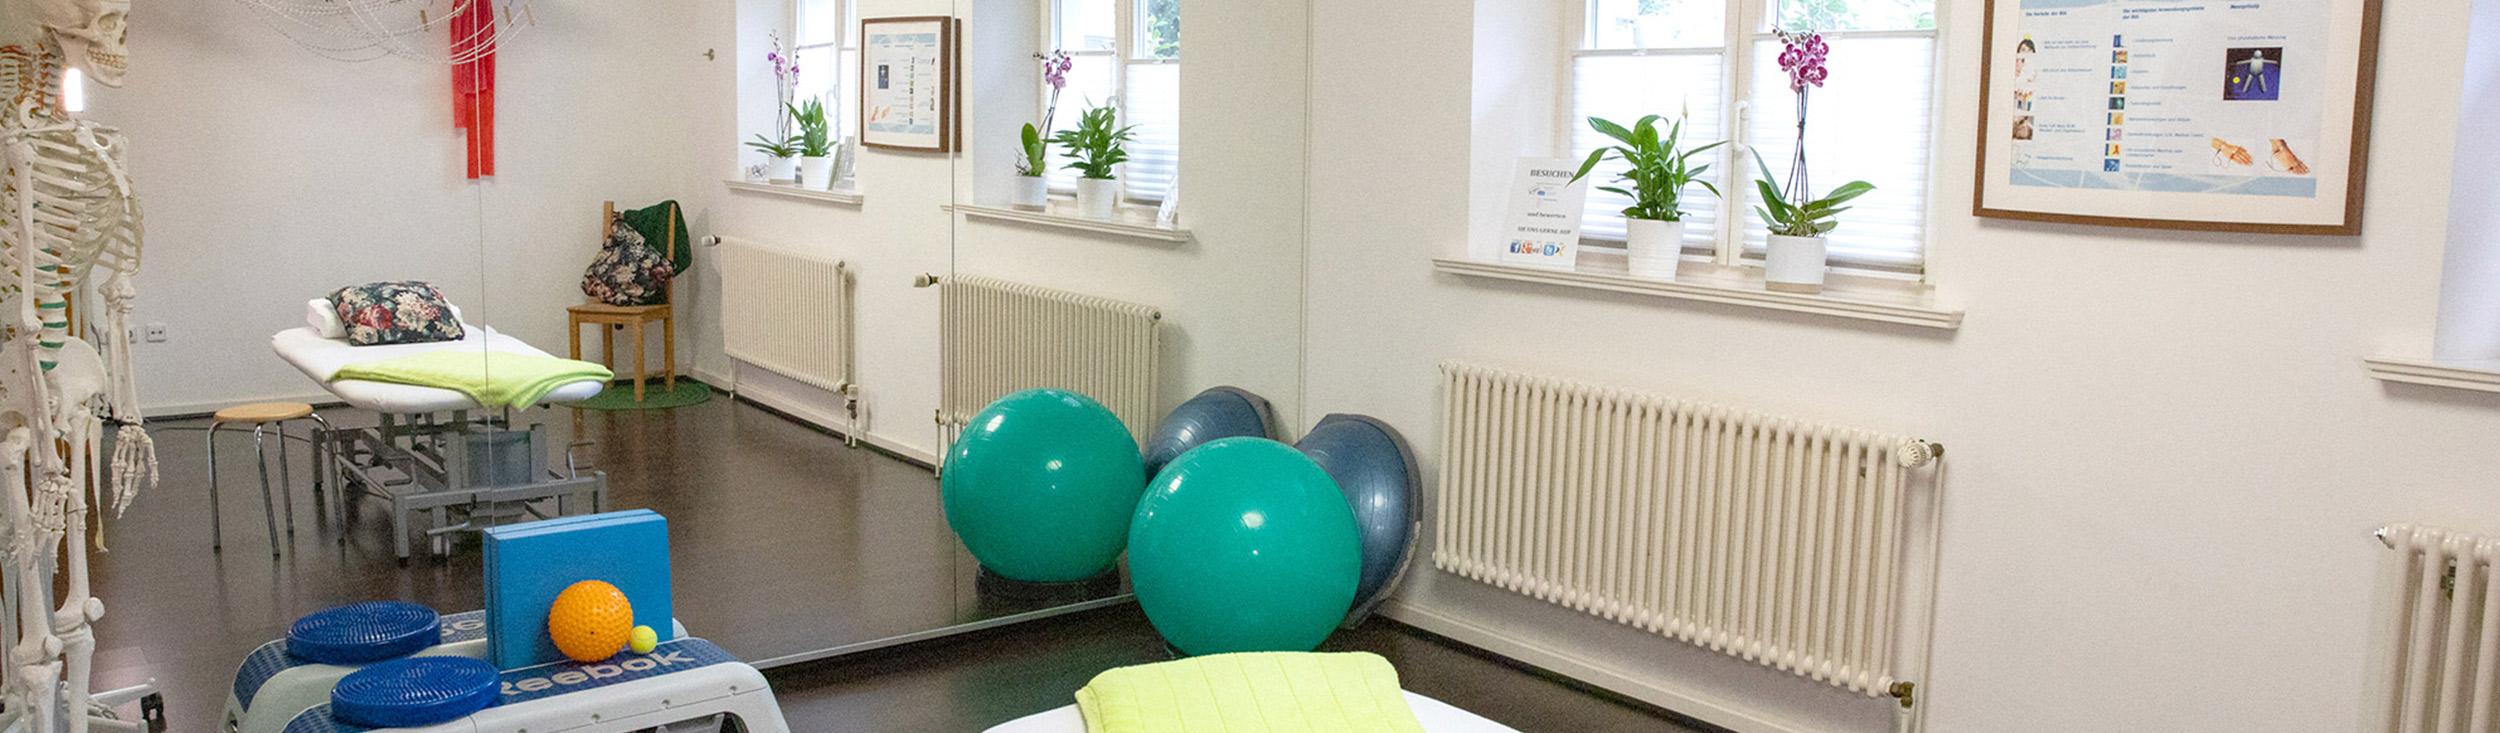 Physiotherapie Praxis Oldenburg